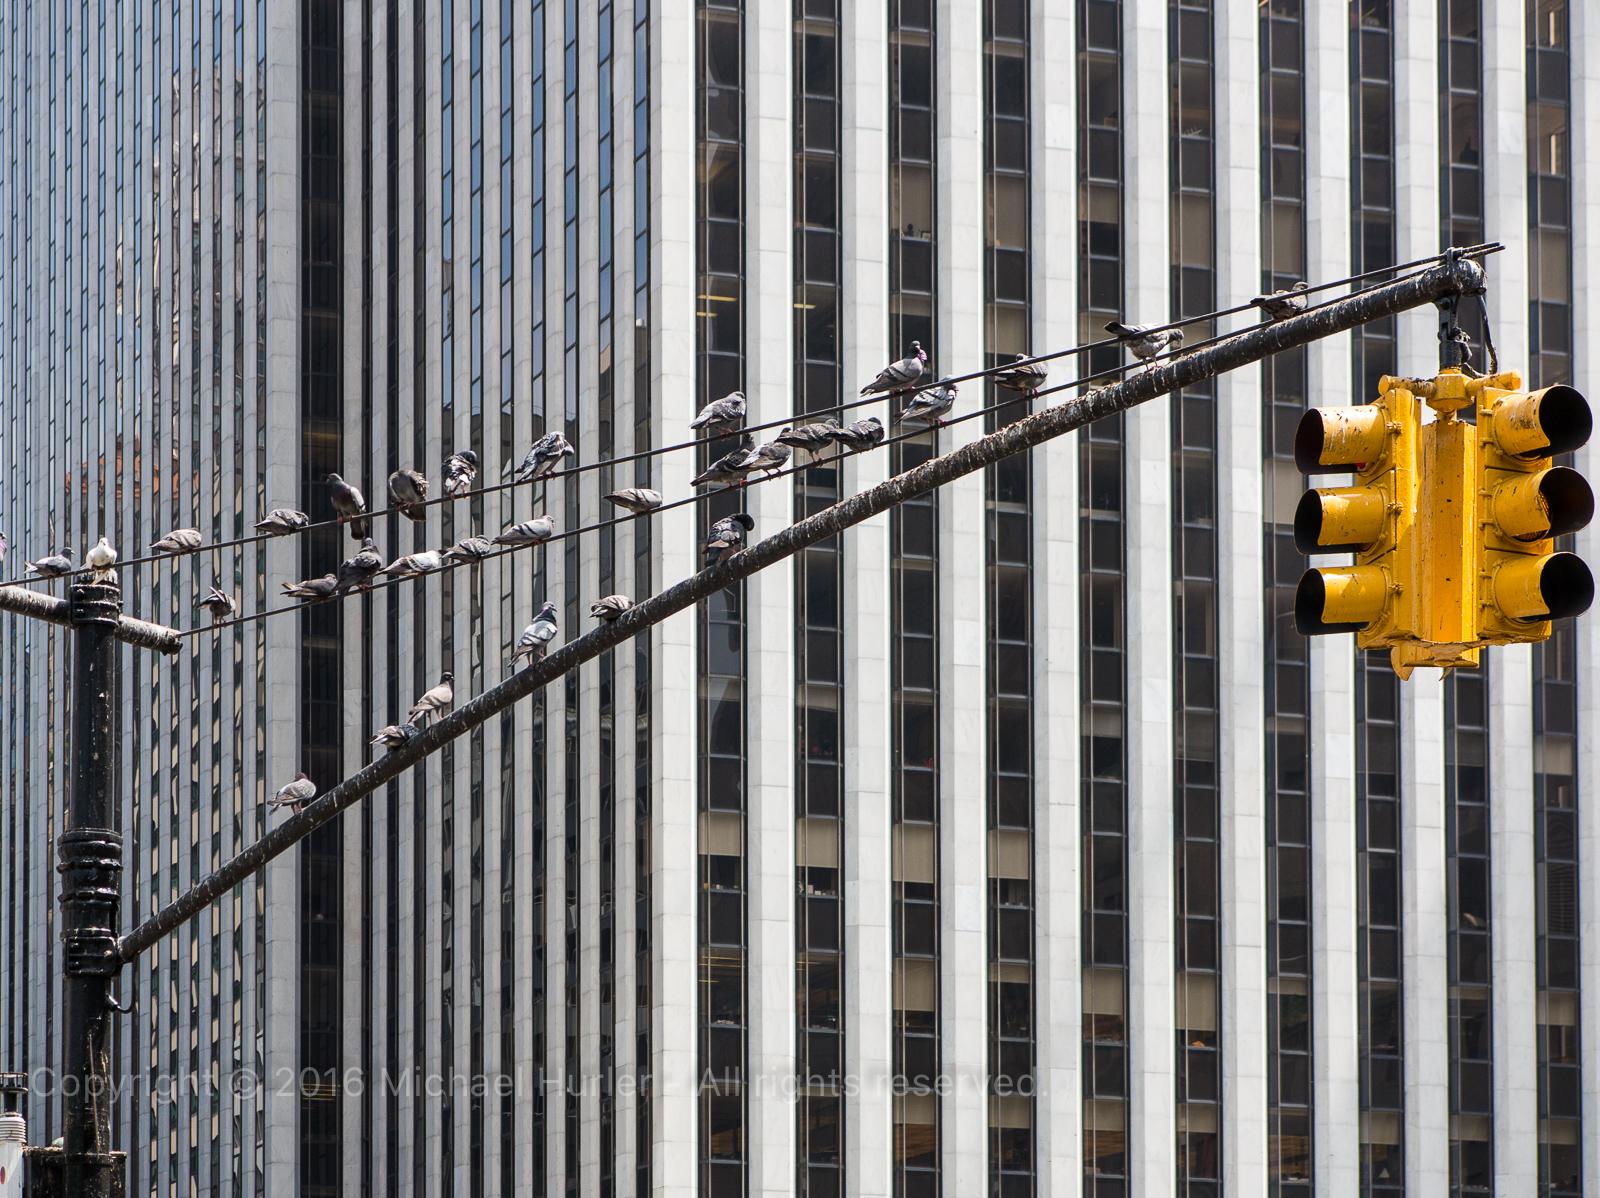 10.05.2015, New York